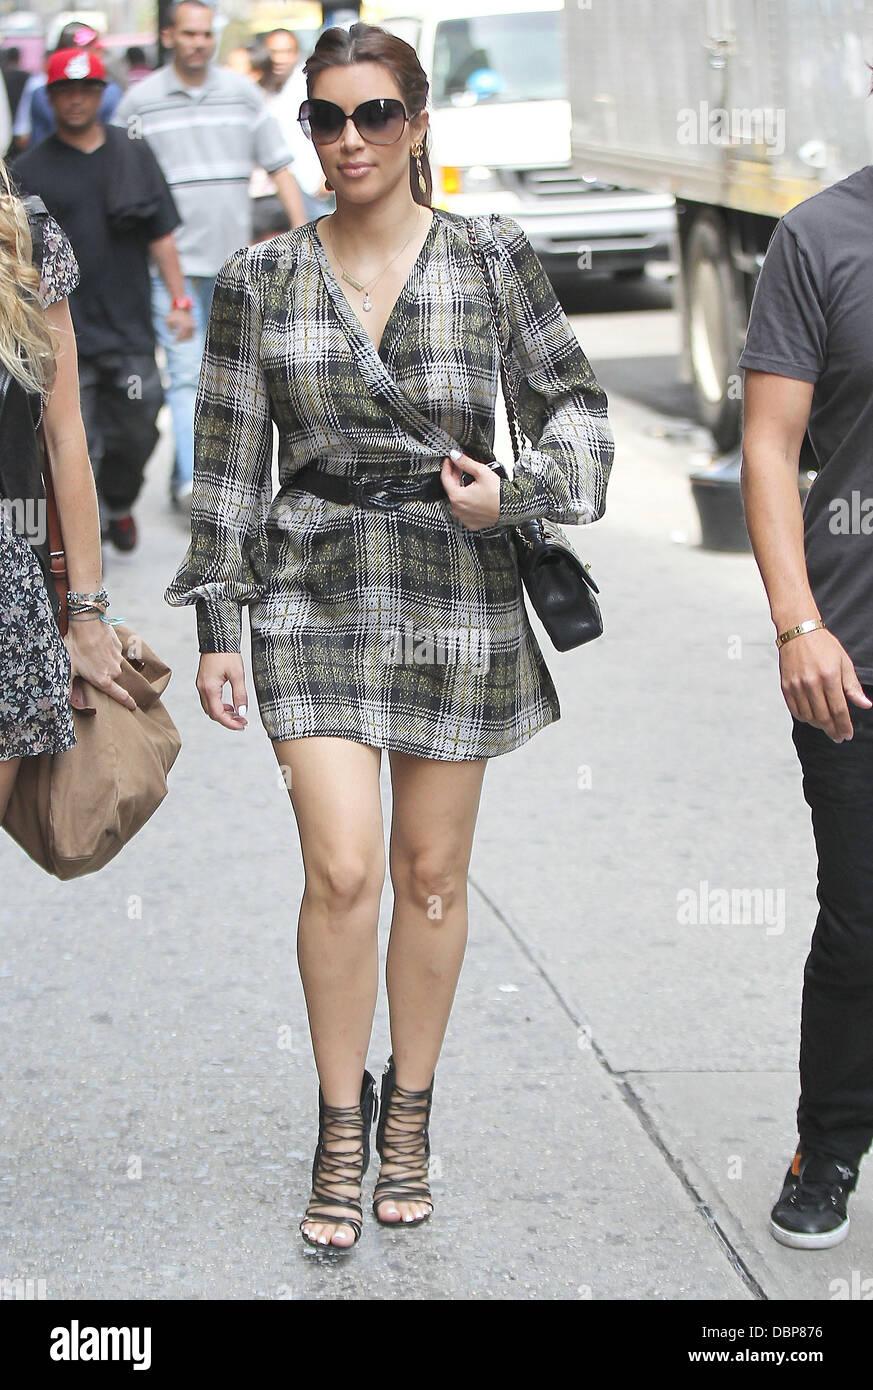 Kim Kardashian Heading To Vera Wang For A Fitting Of Her Wedding